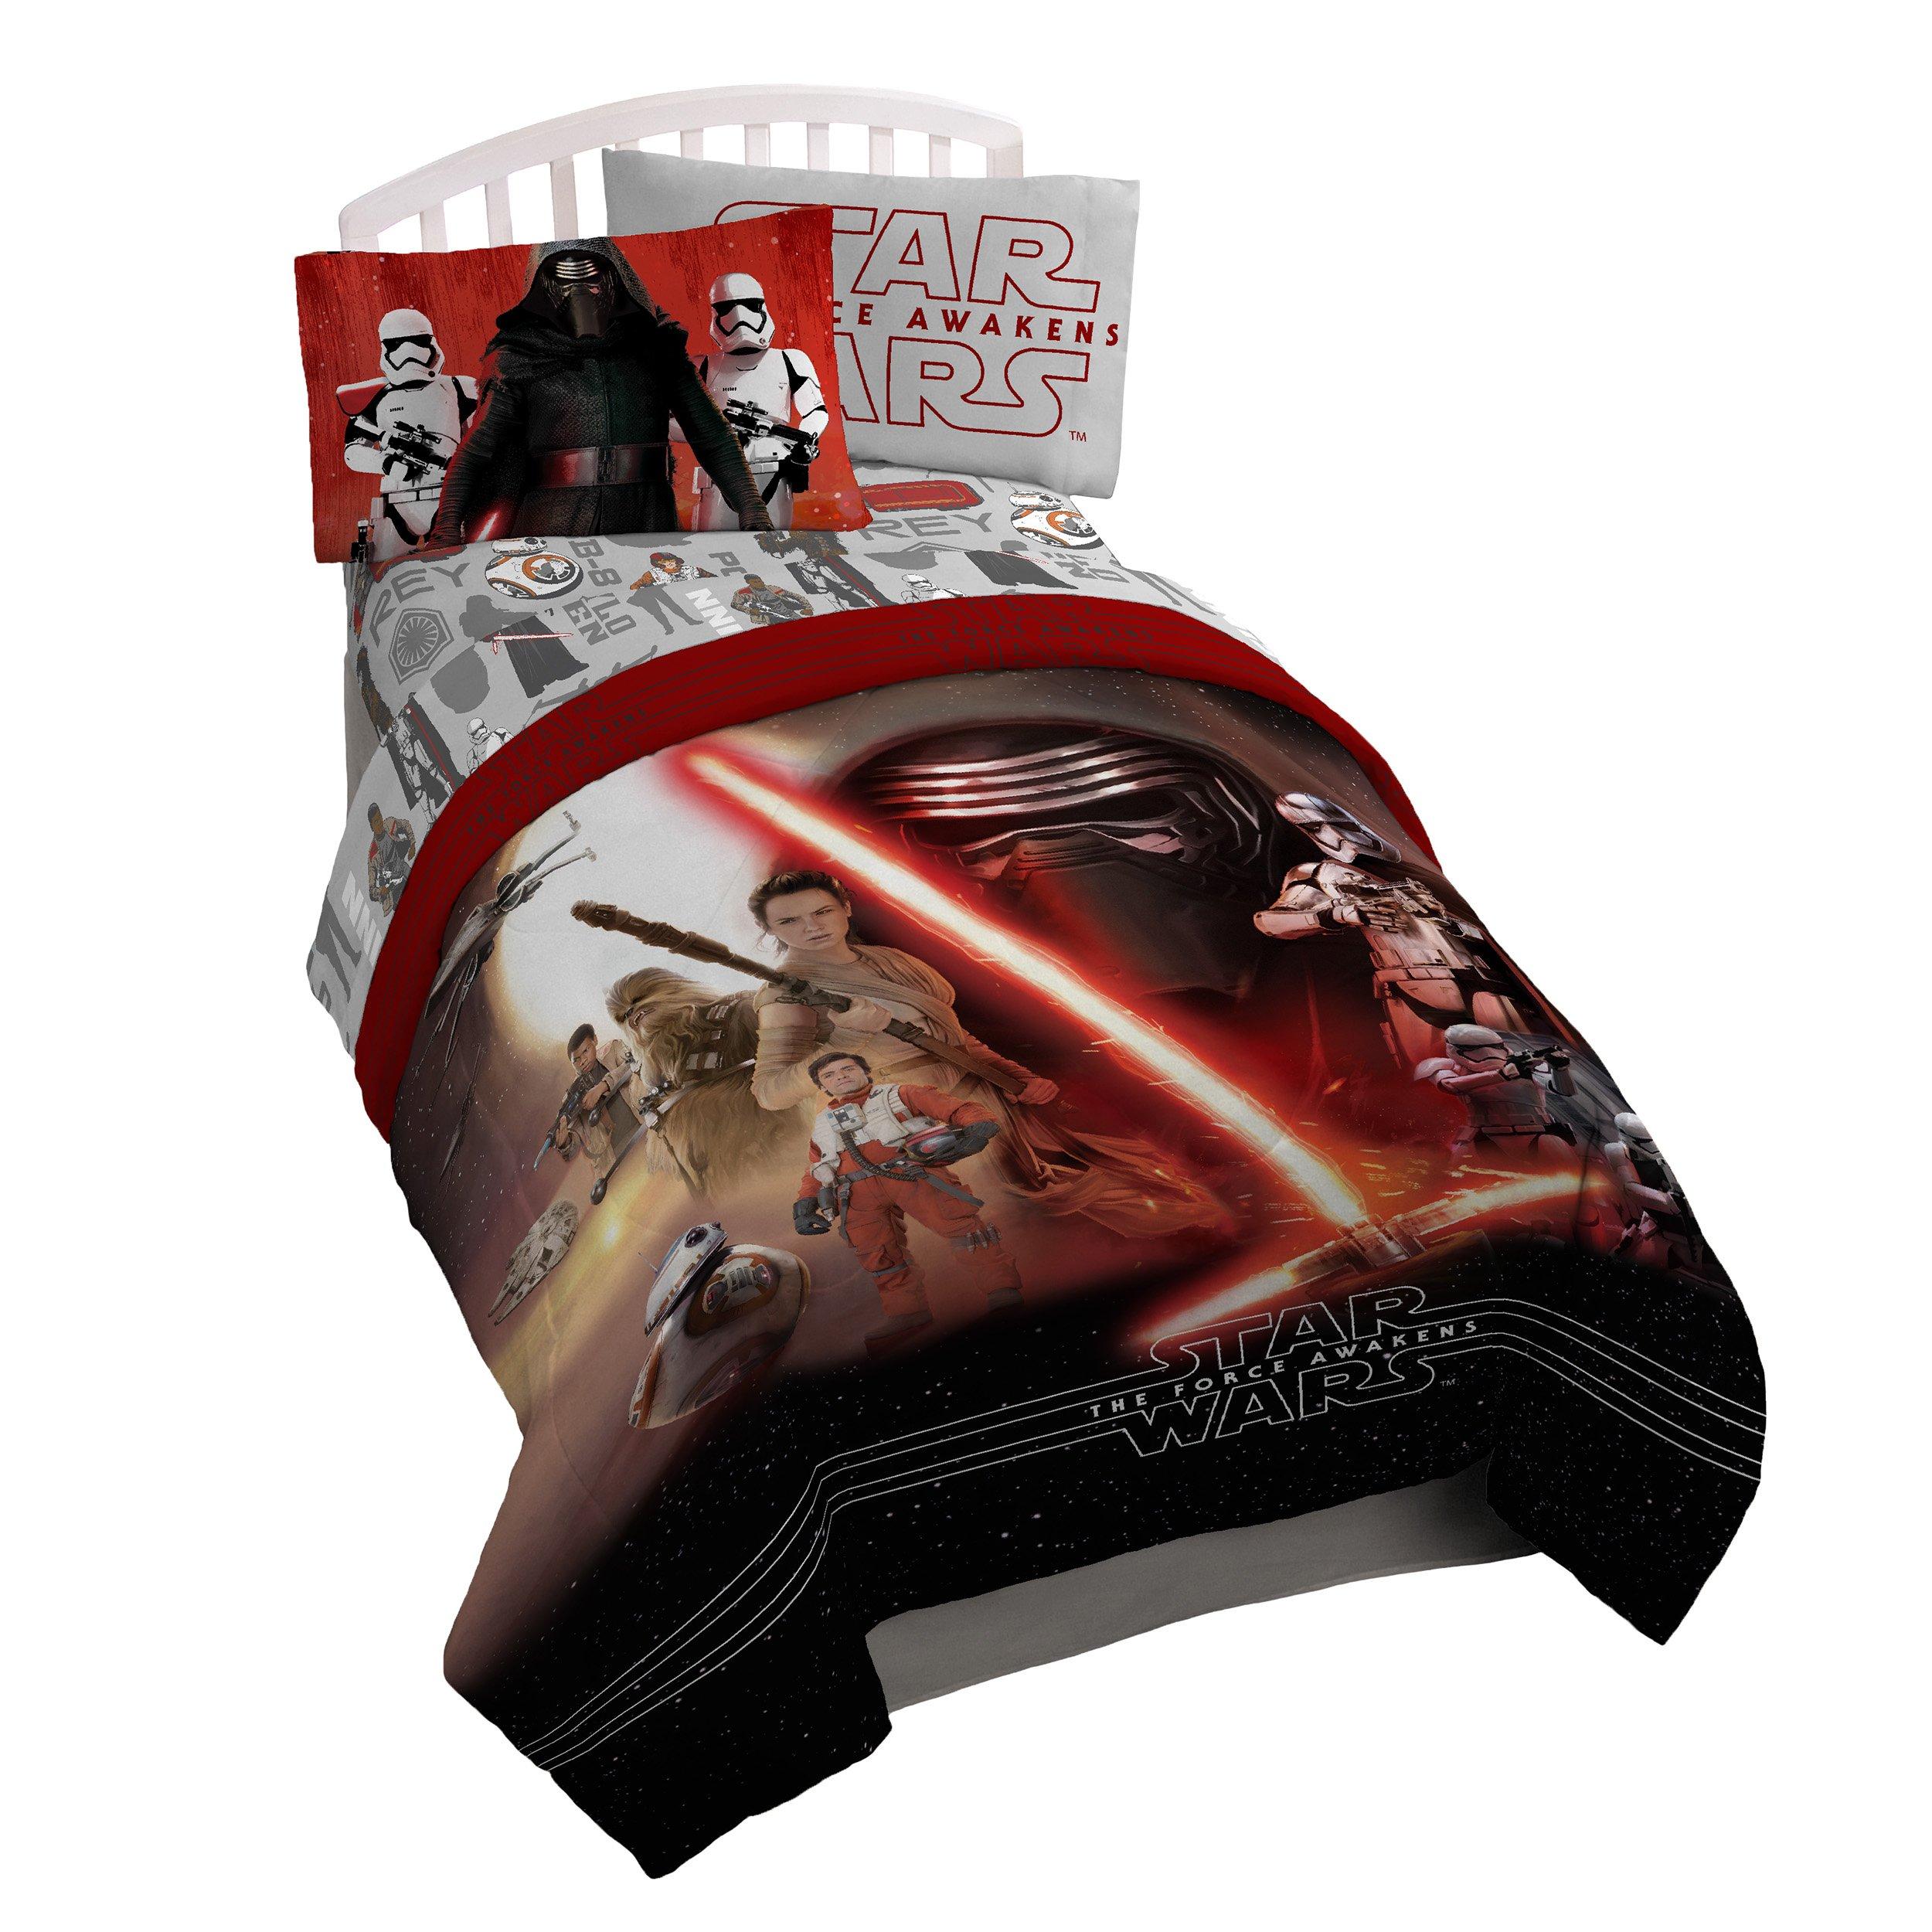 Star Wars Ep7 Force Awakens Twin/Full Reversible Comforter